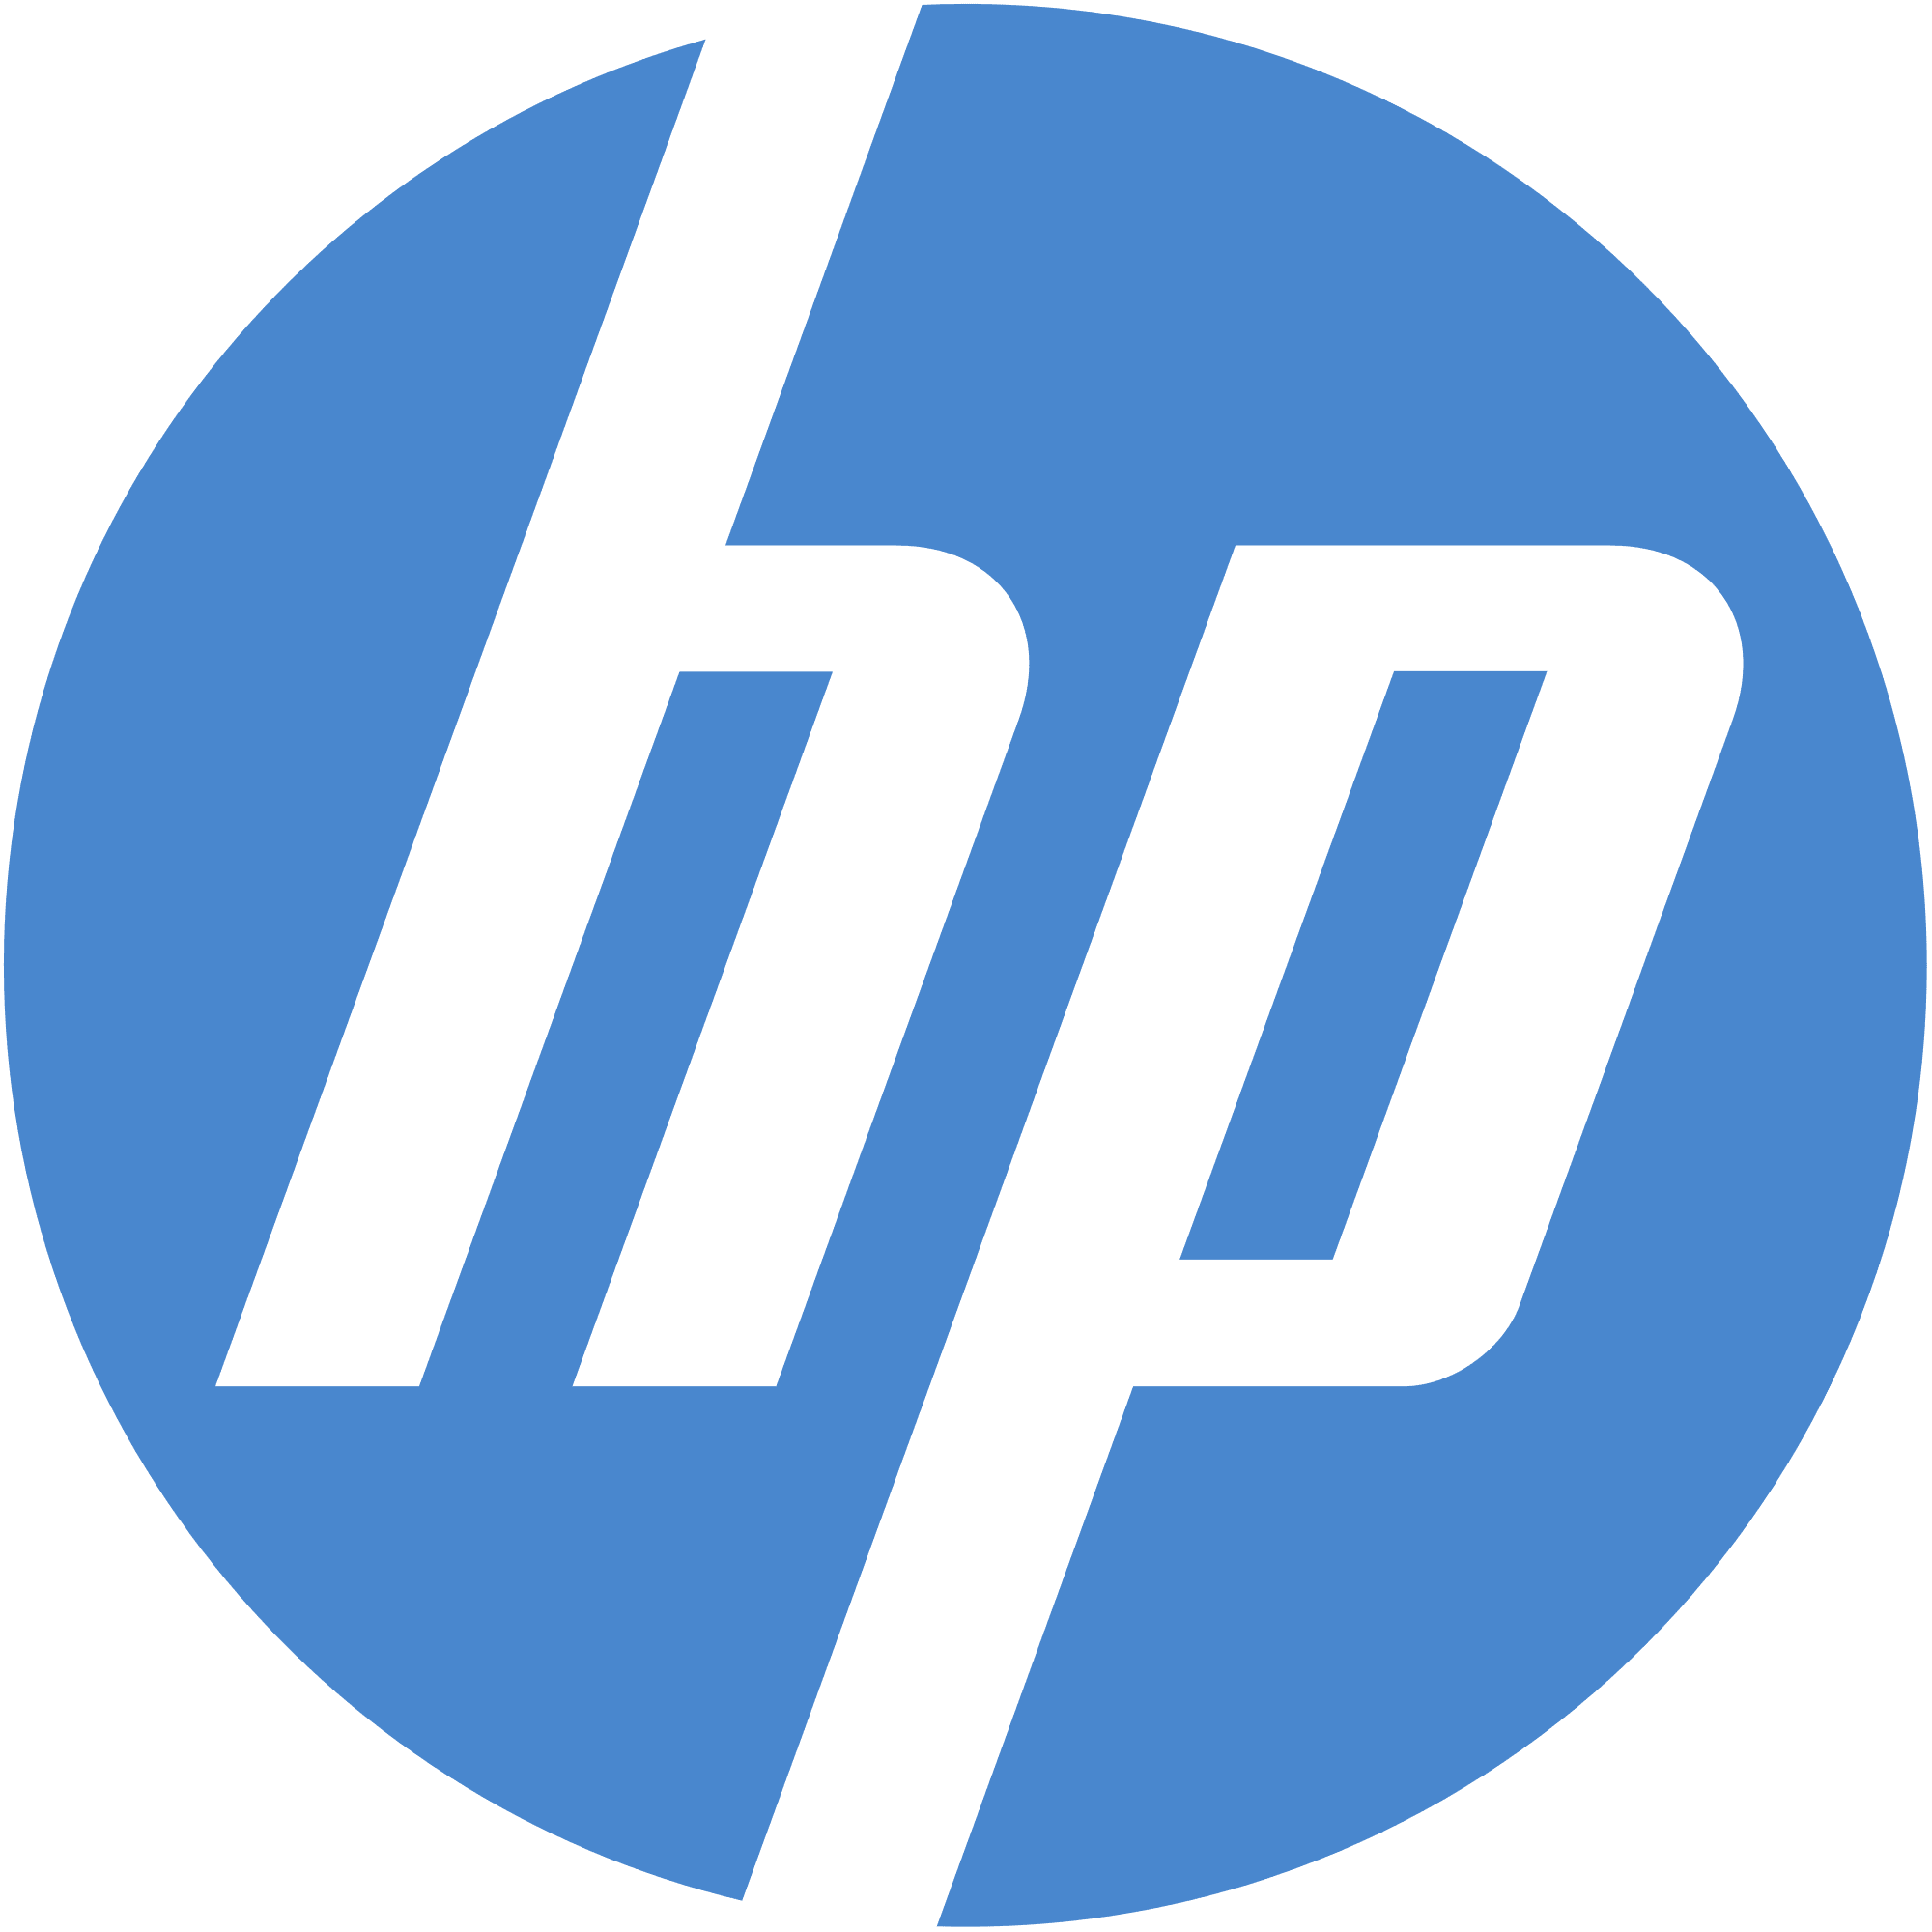 HP Deskjet 2510 All-in-One Printer drivers